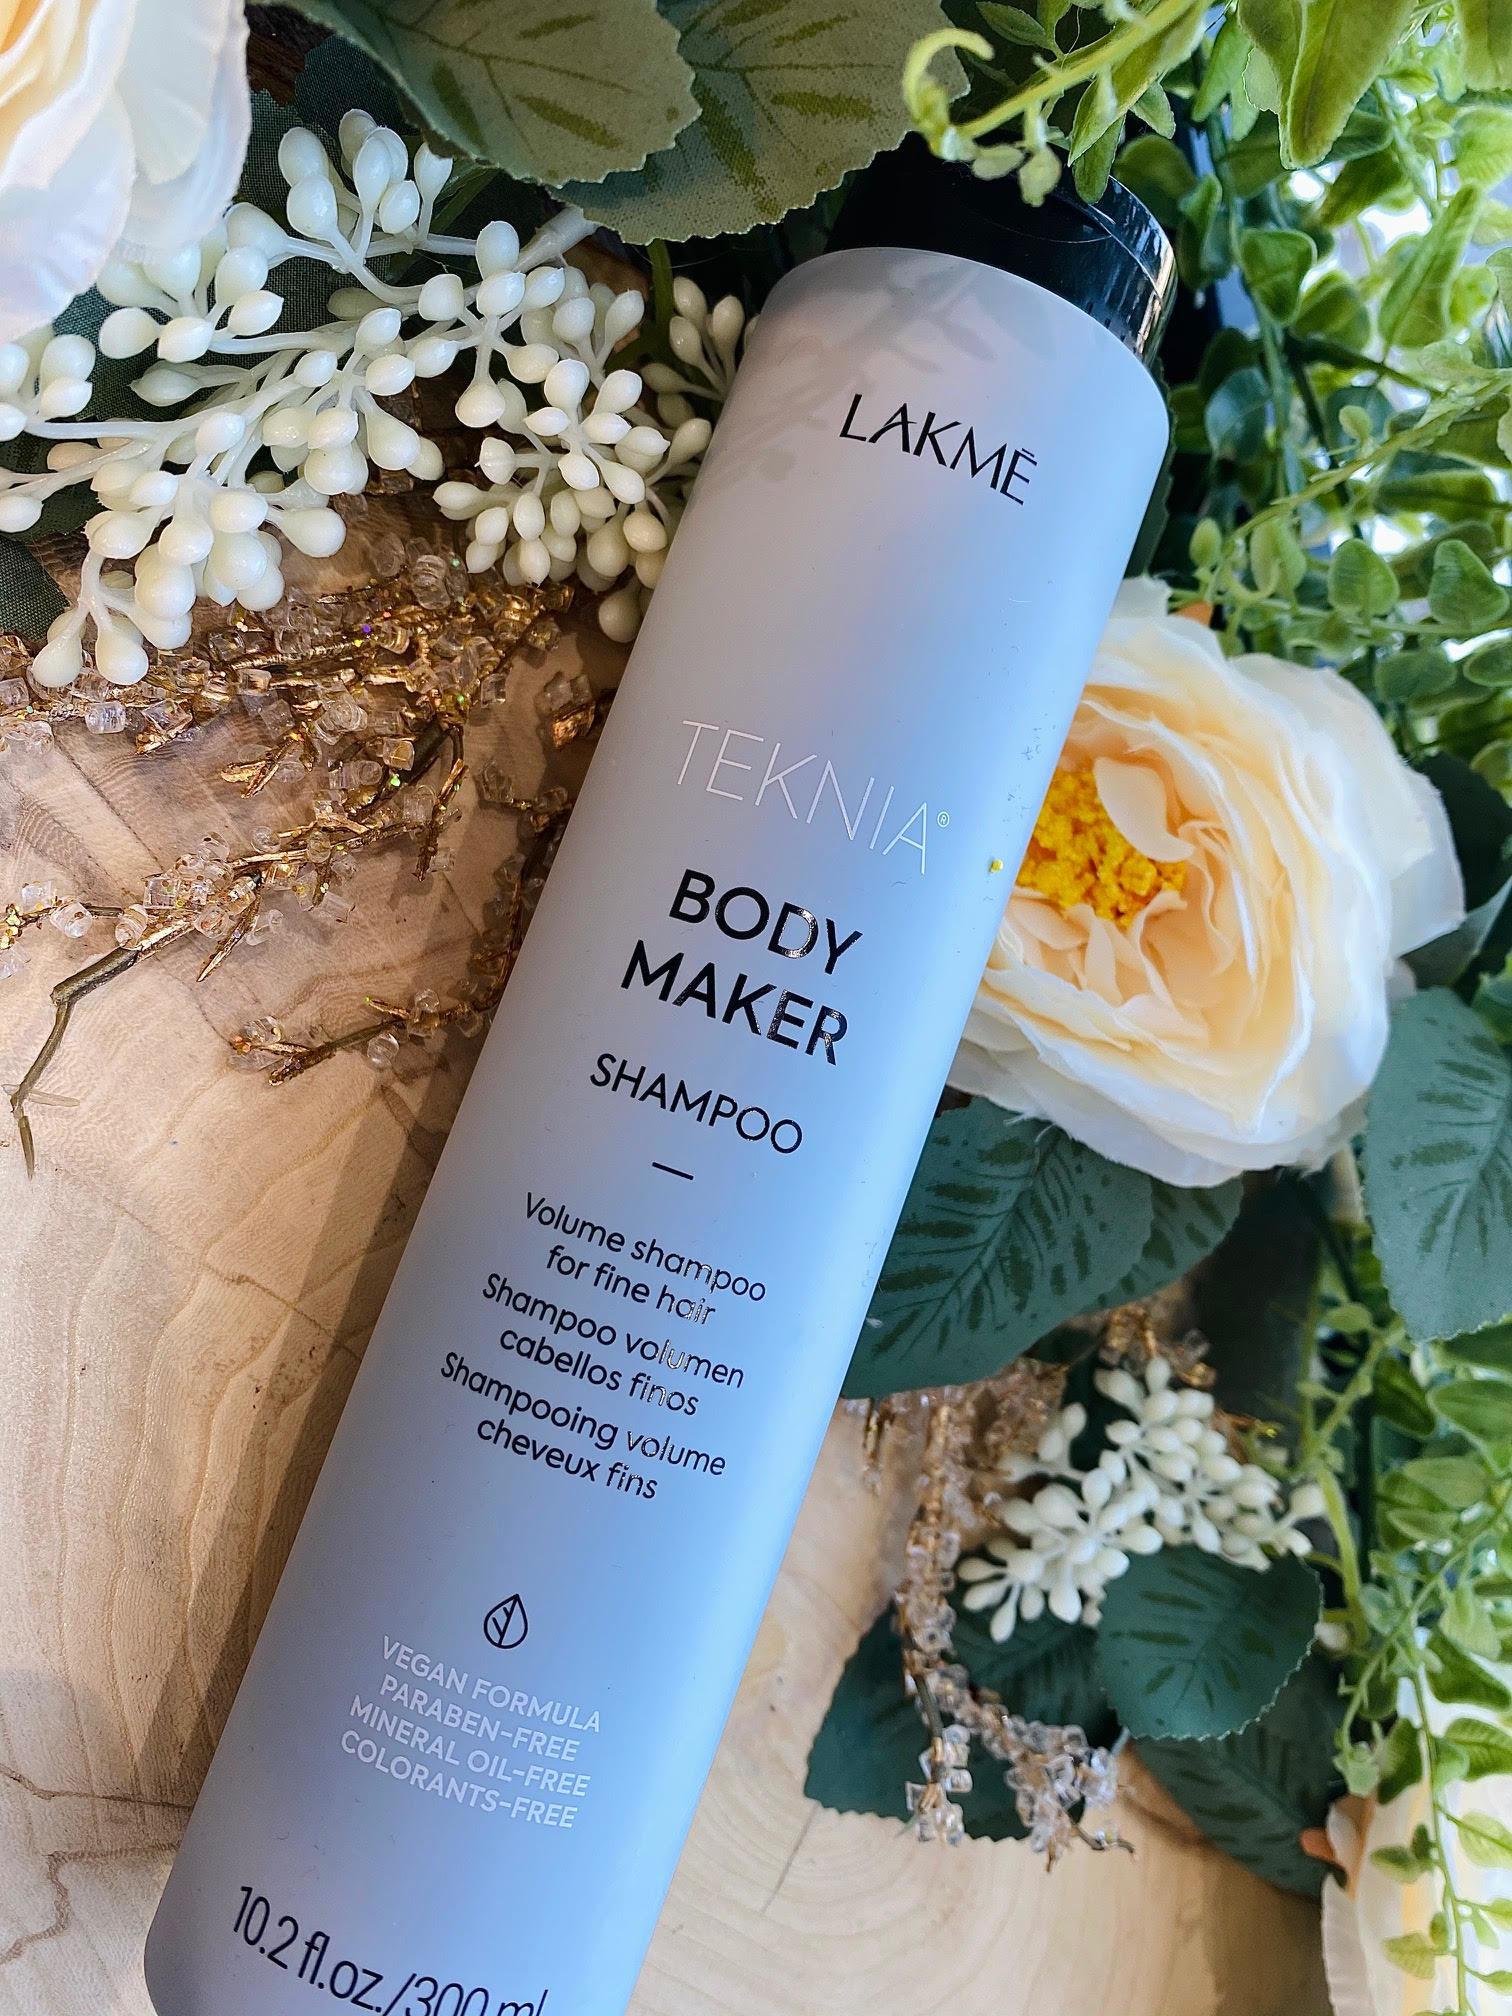 Lakmé TEKNIA body maker Shampooing 300ml